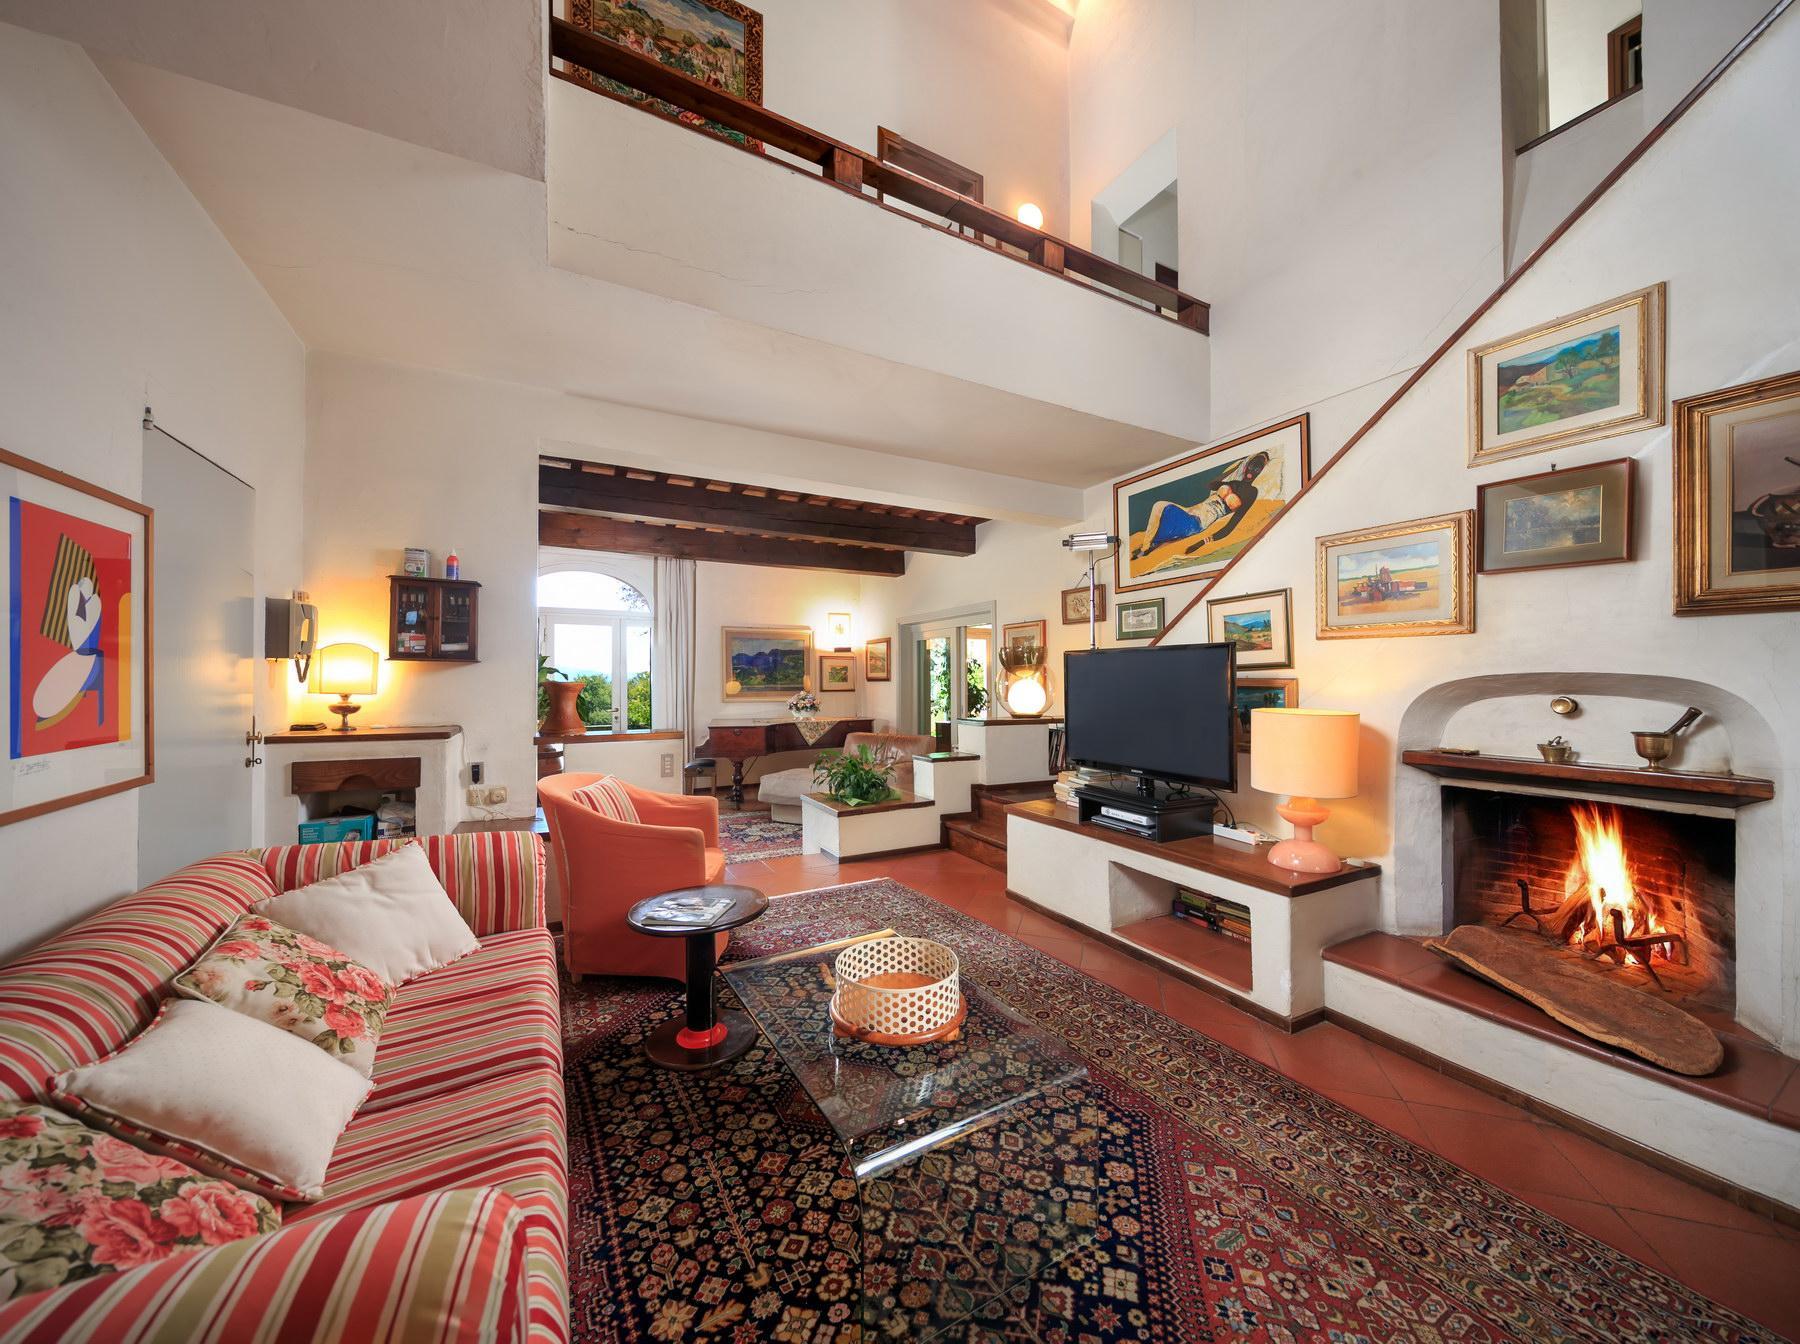 Wonderful farmhouse on the Tuscan hills - 11